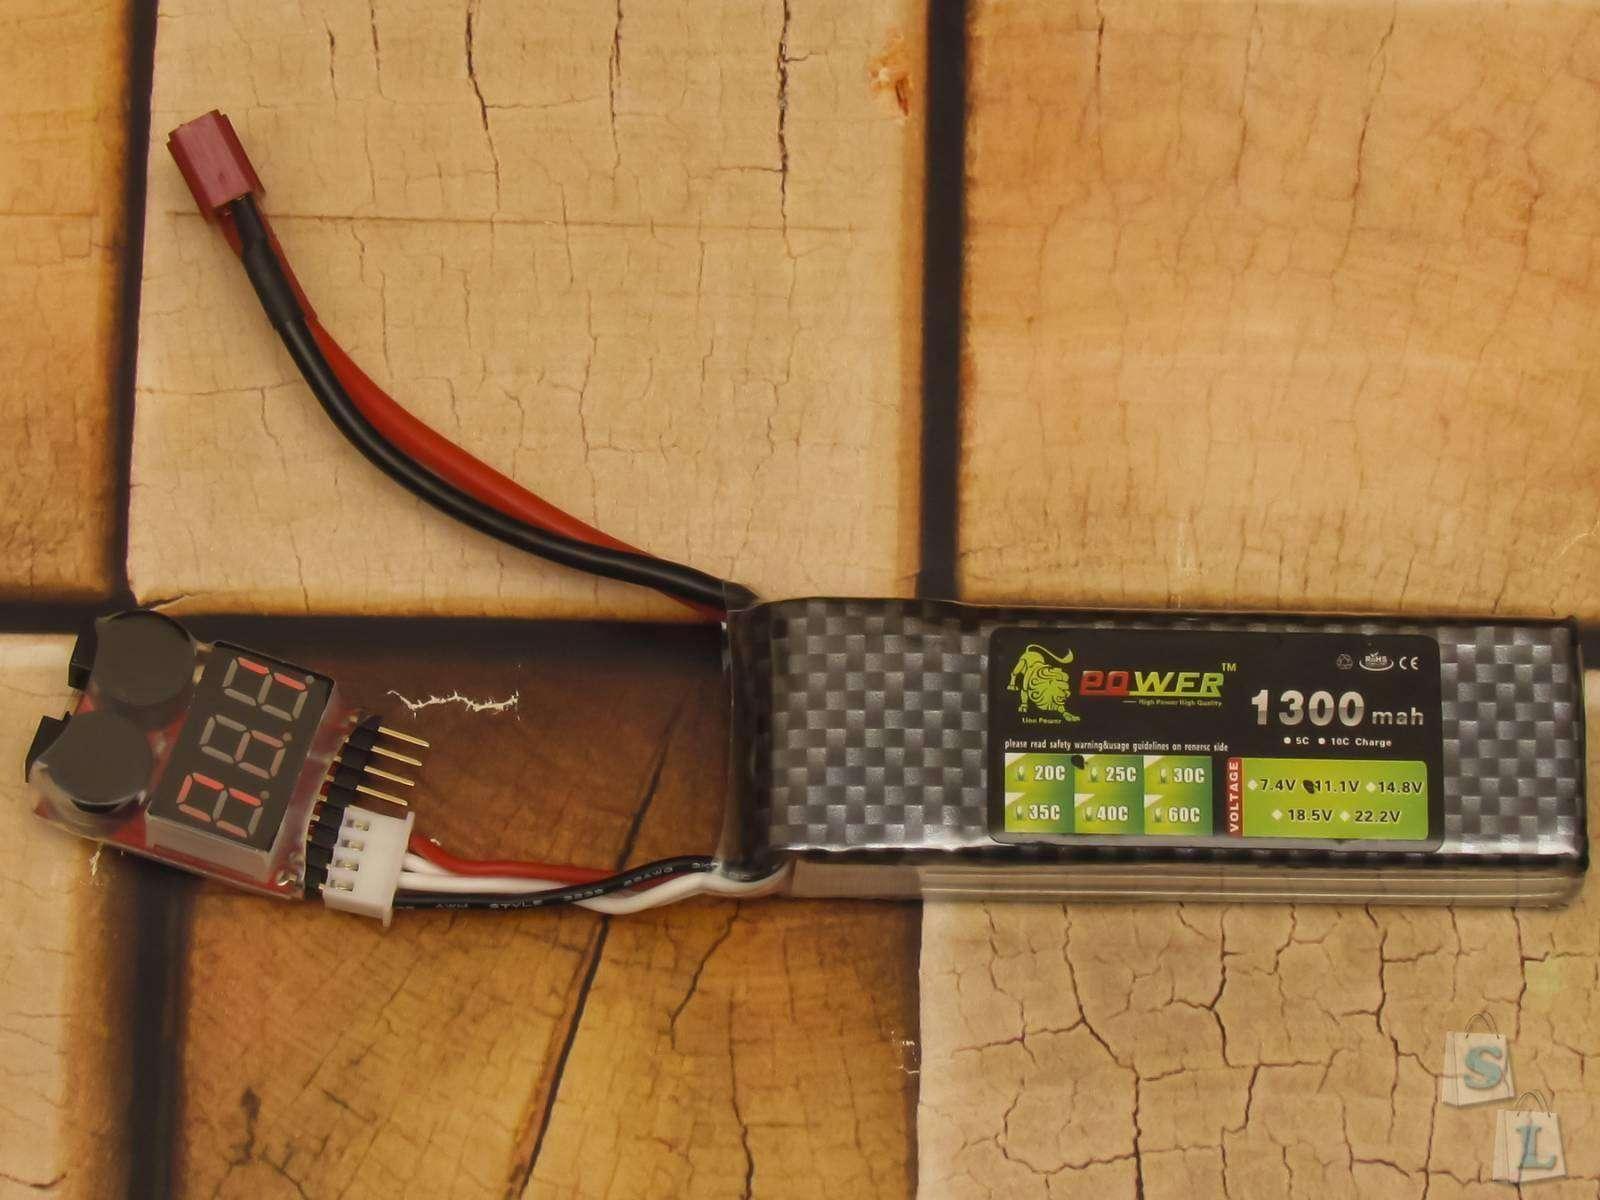 Aliexpress: Контролер разряда LiOn LiPo аккумуляторов